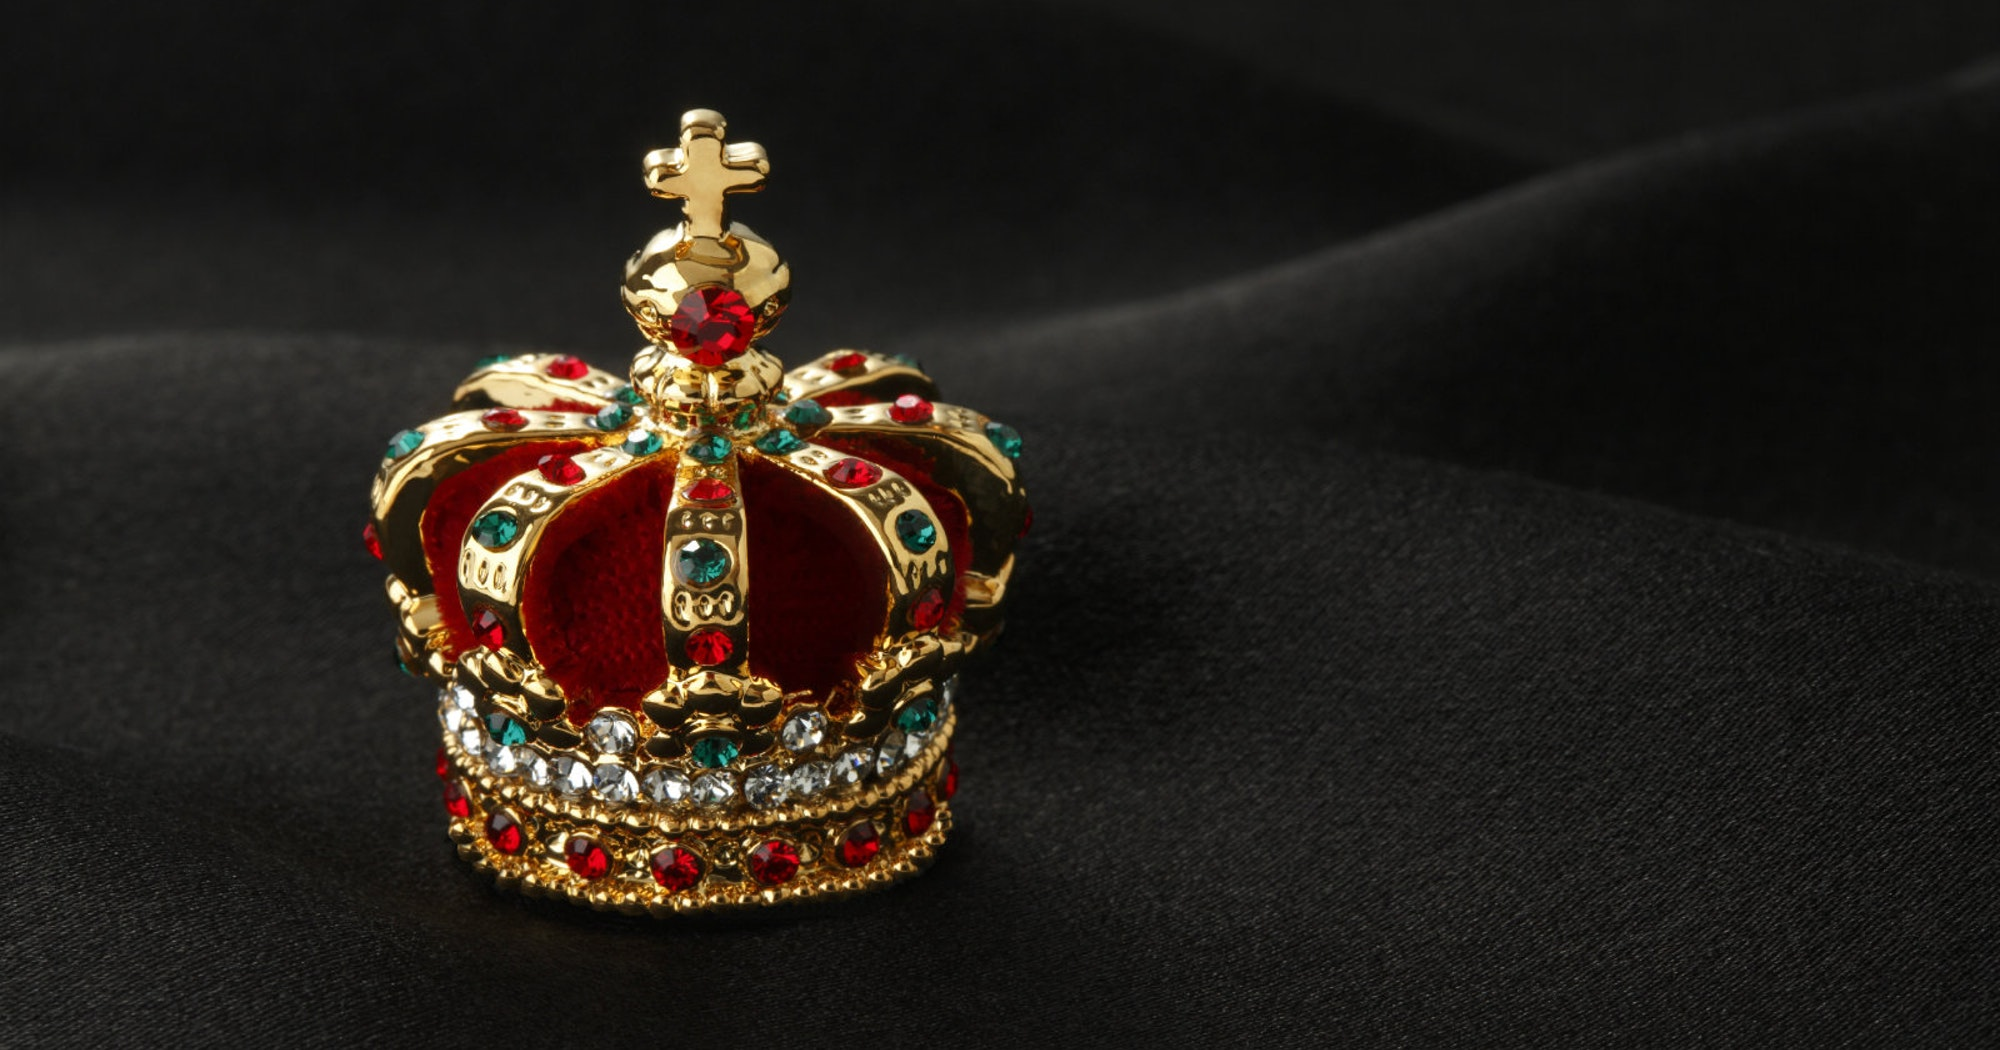 We Need a Real King | Desiring God